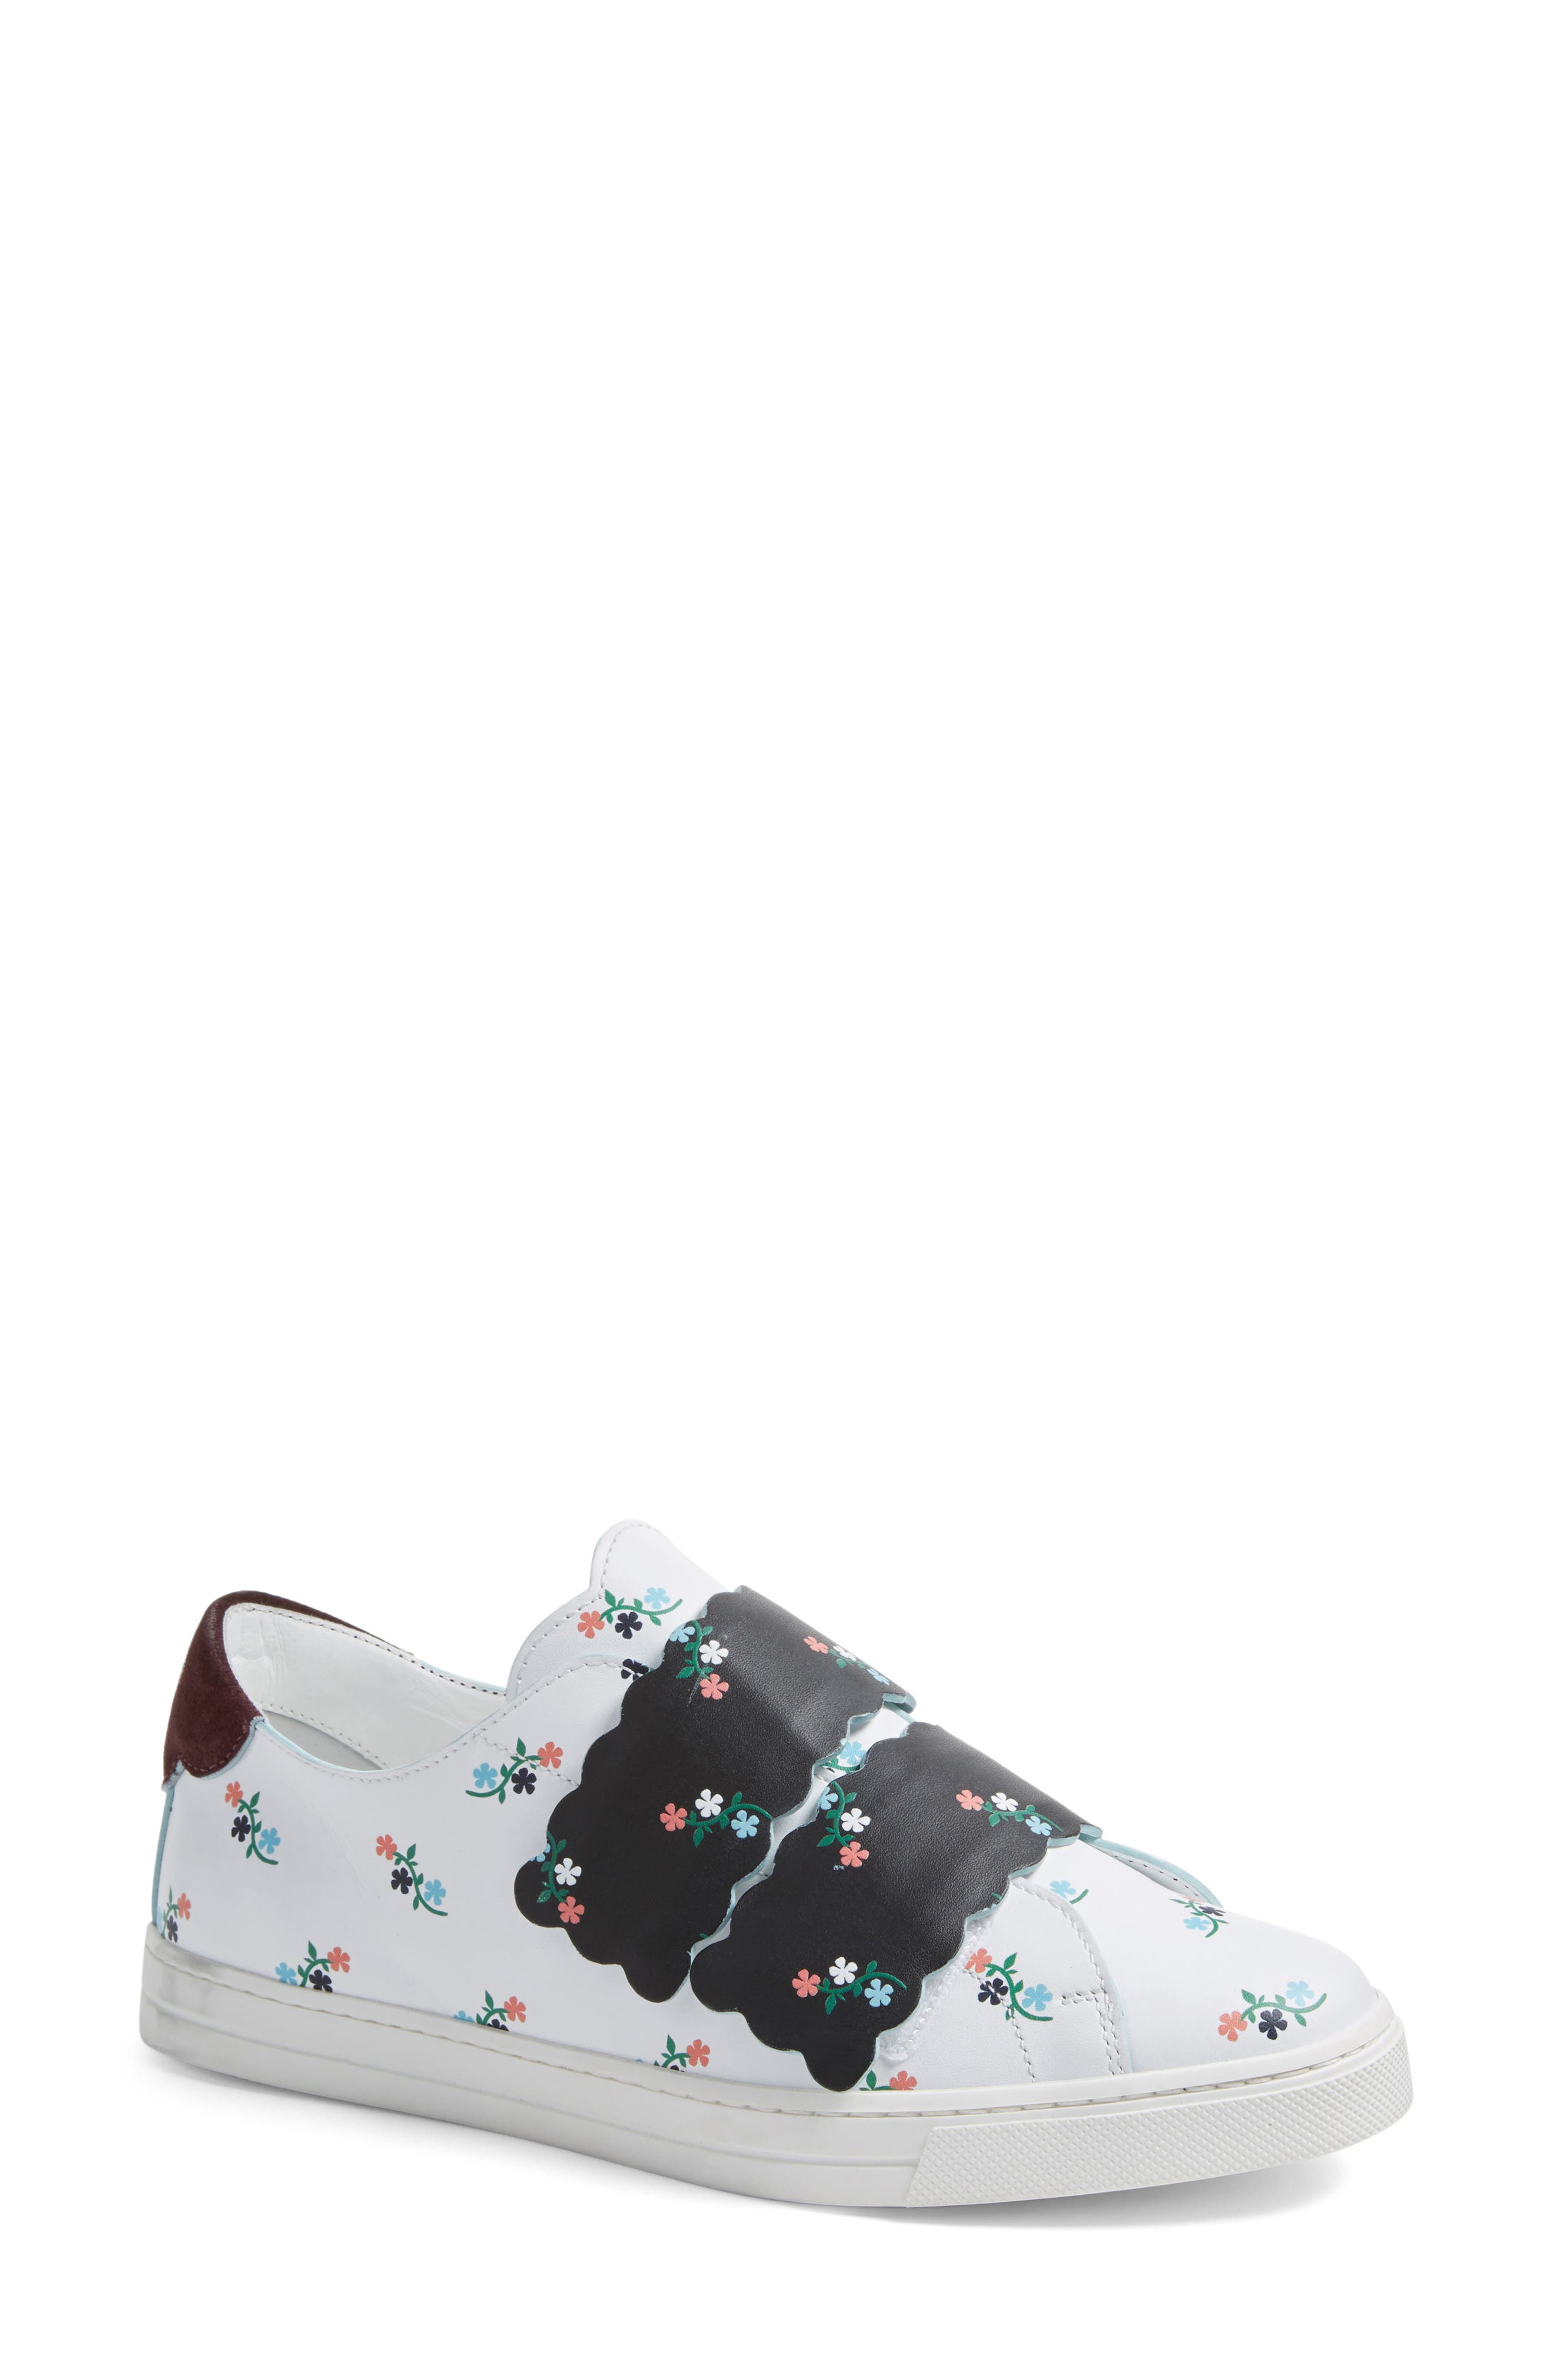 Main Image - Fendi Scallop Sneaker (Women)